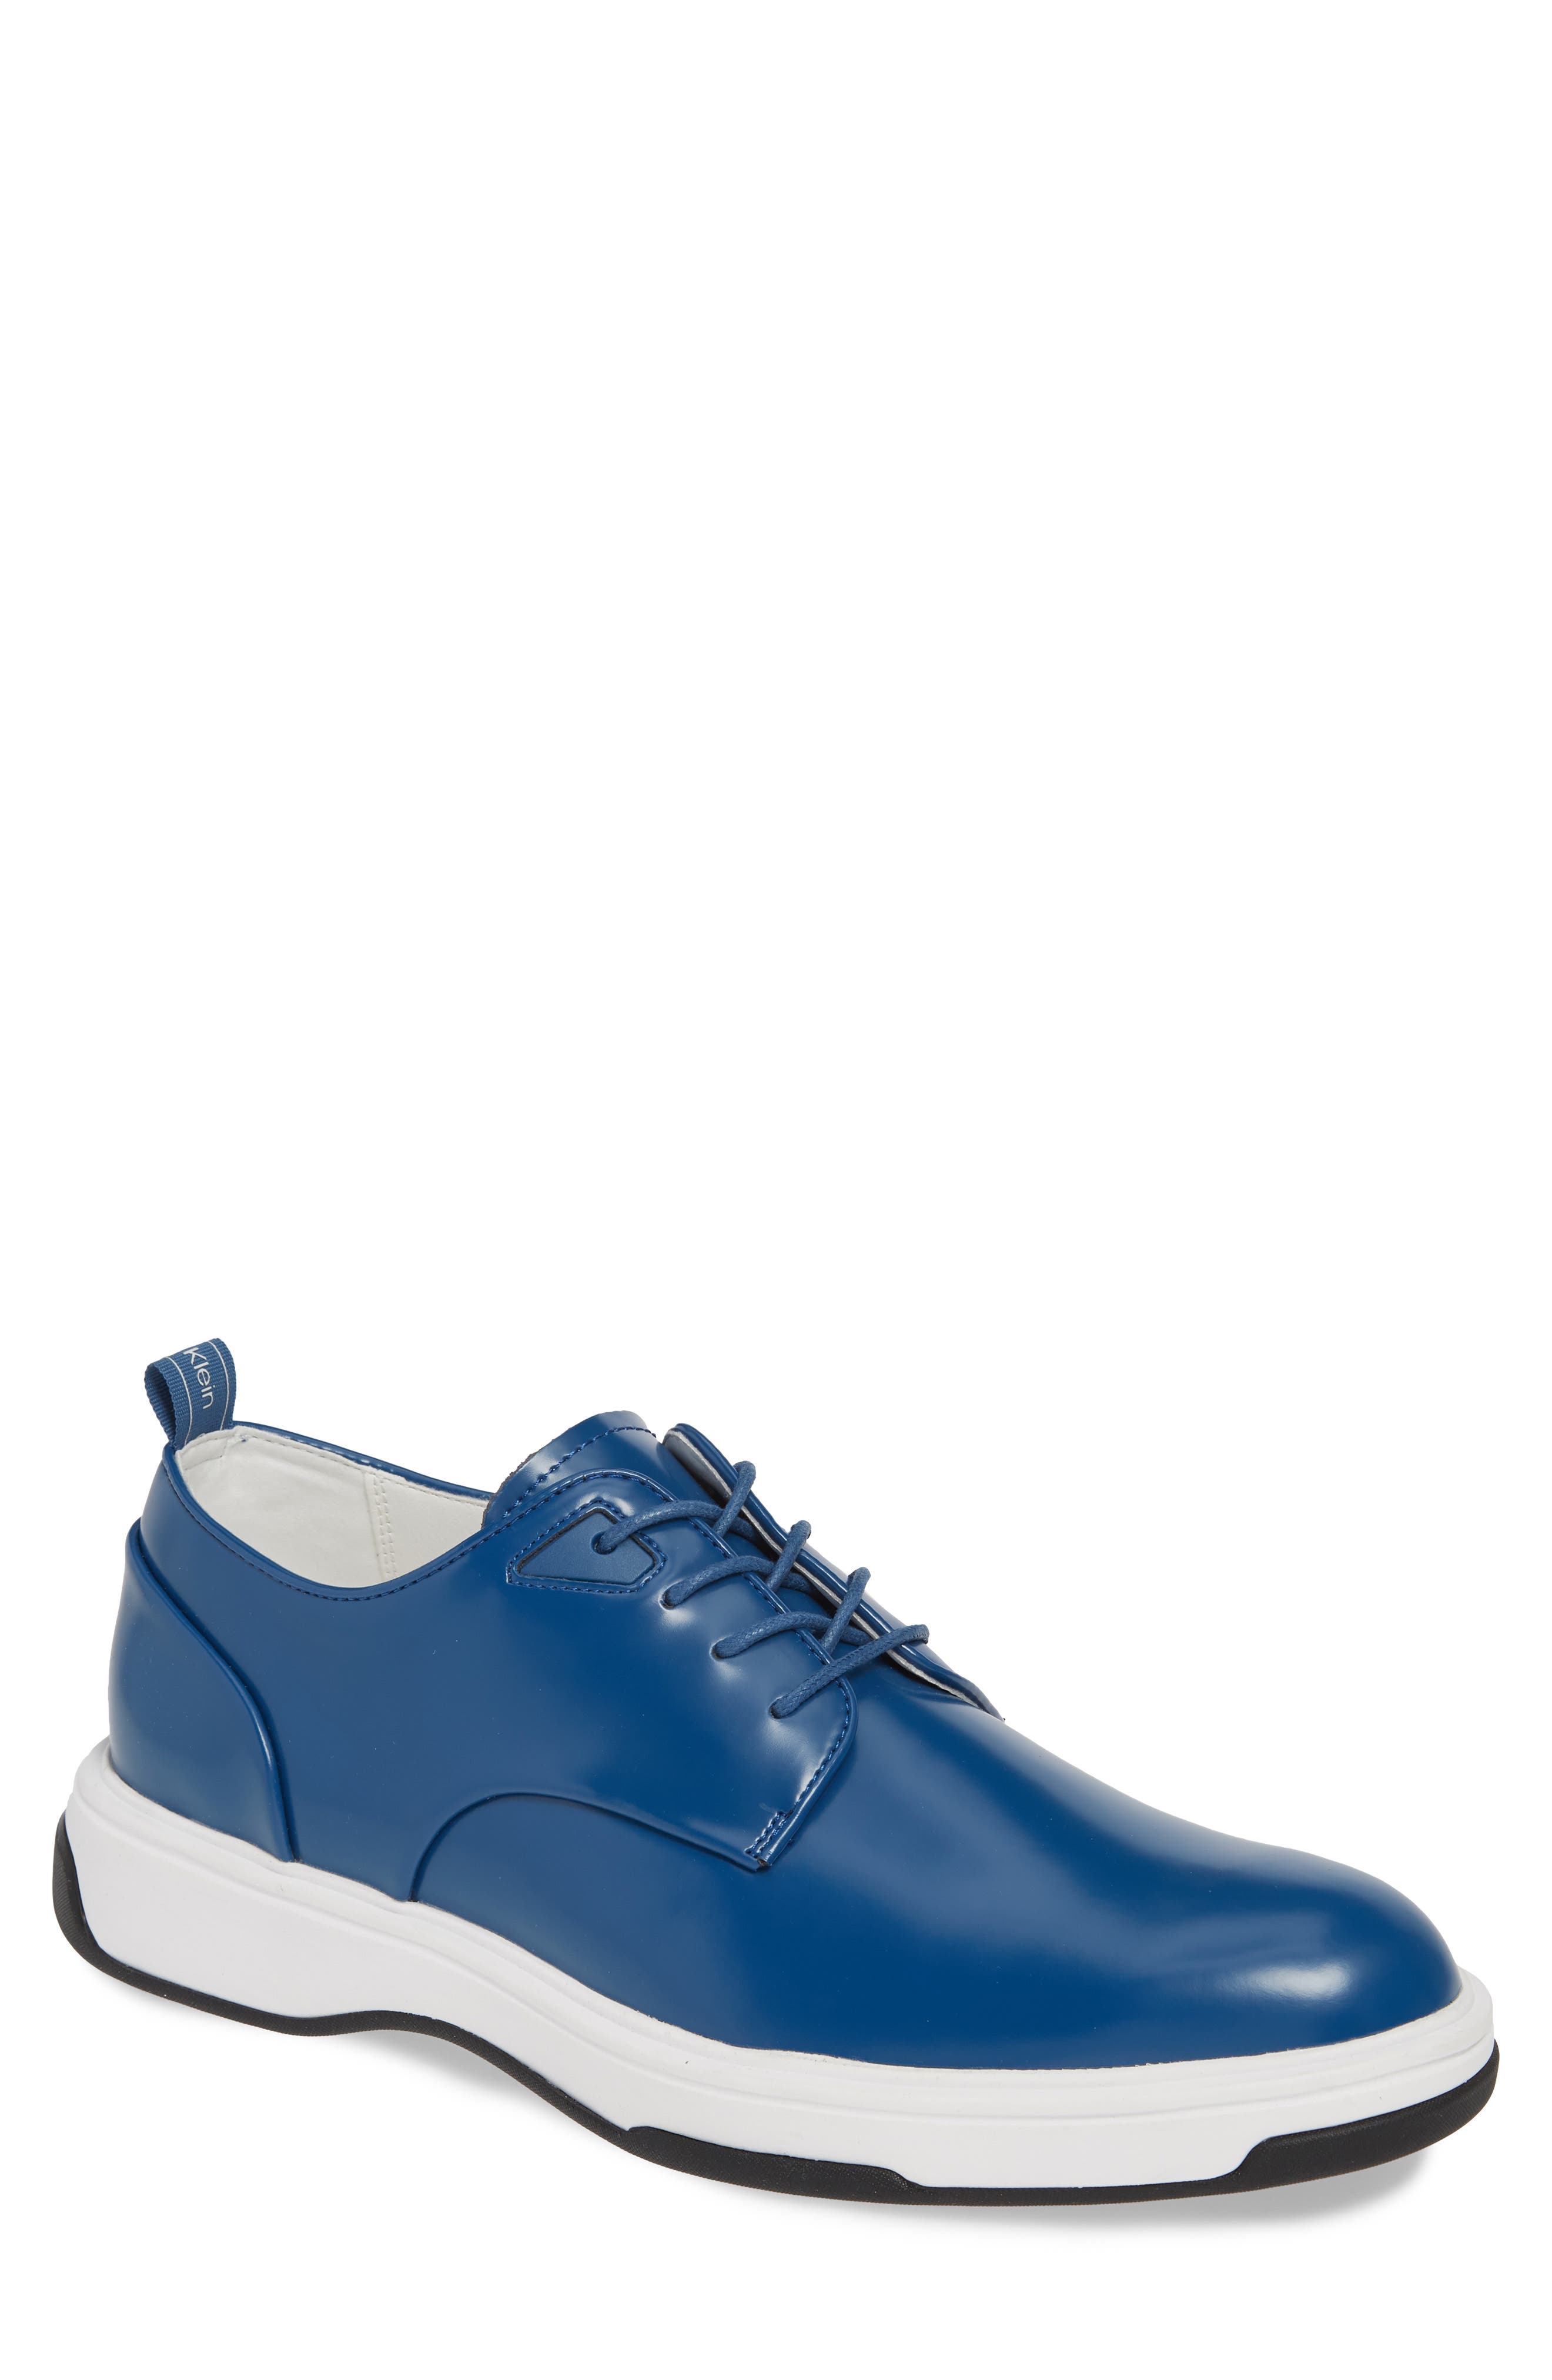 Calvin Klein Patsy Sneaker, Blue